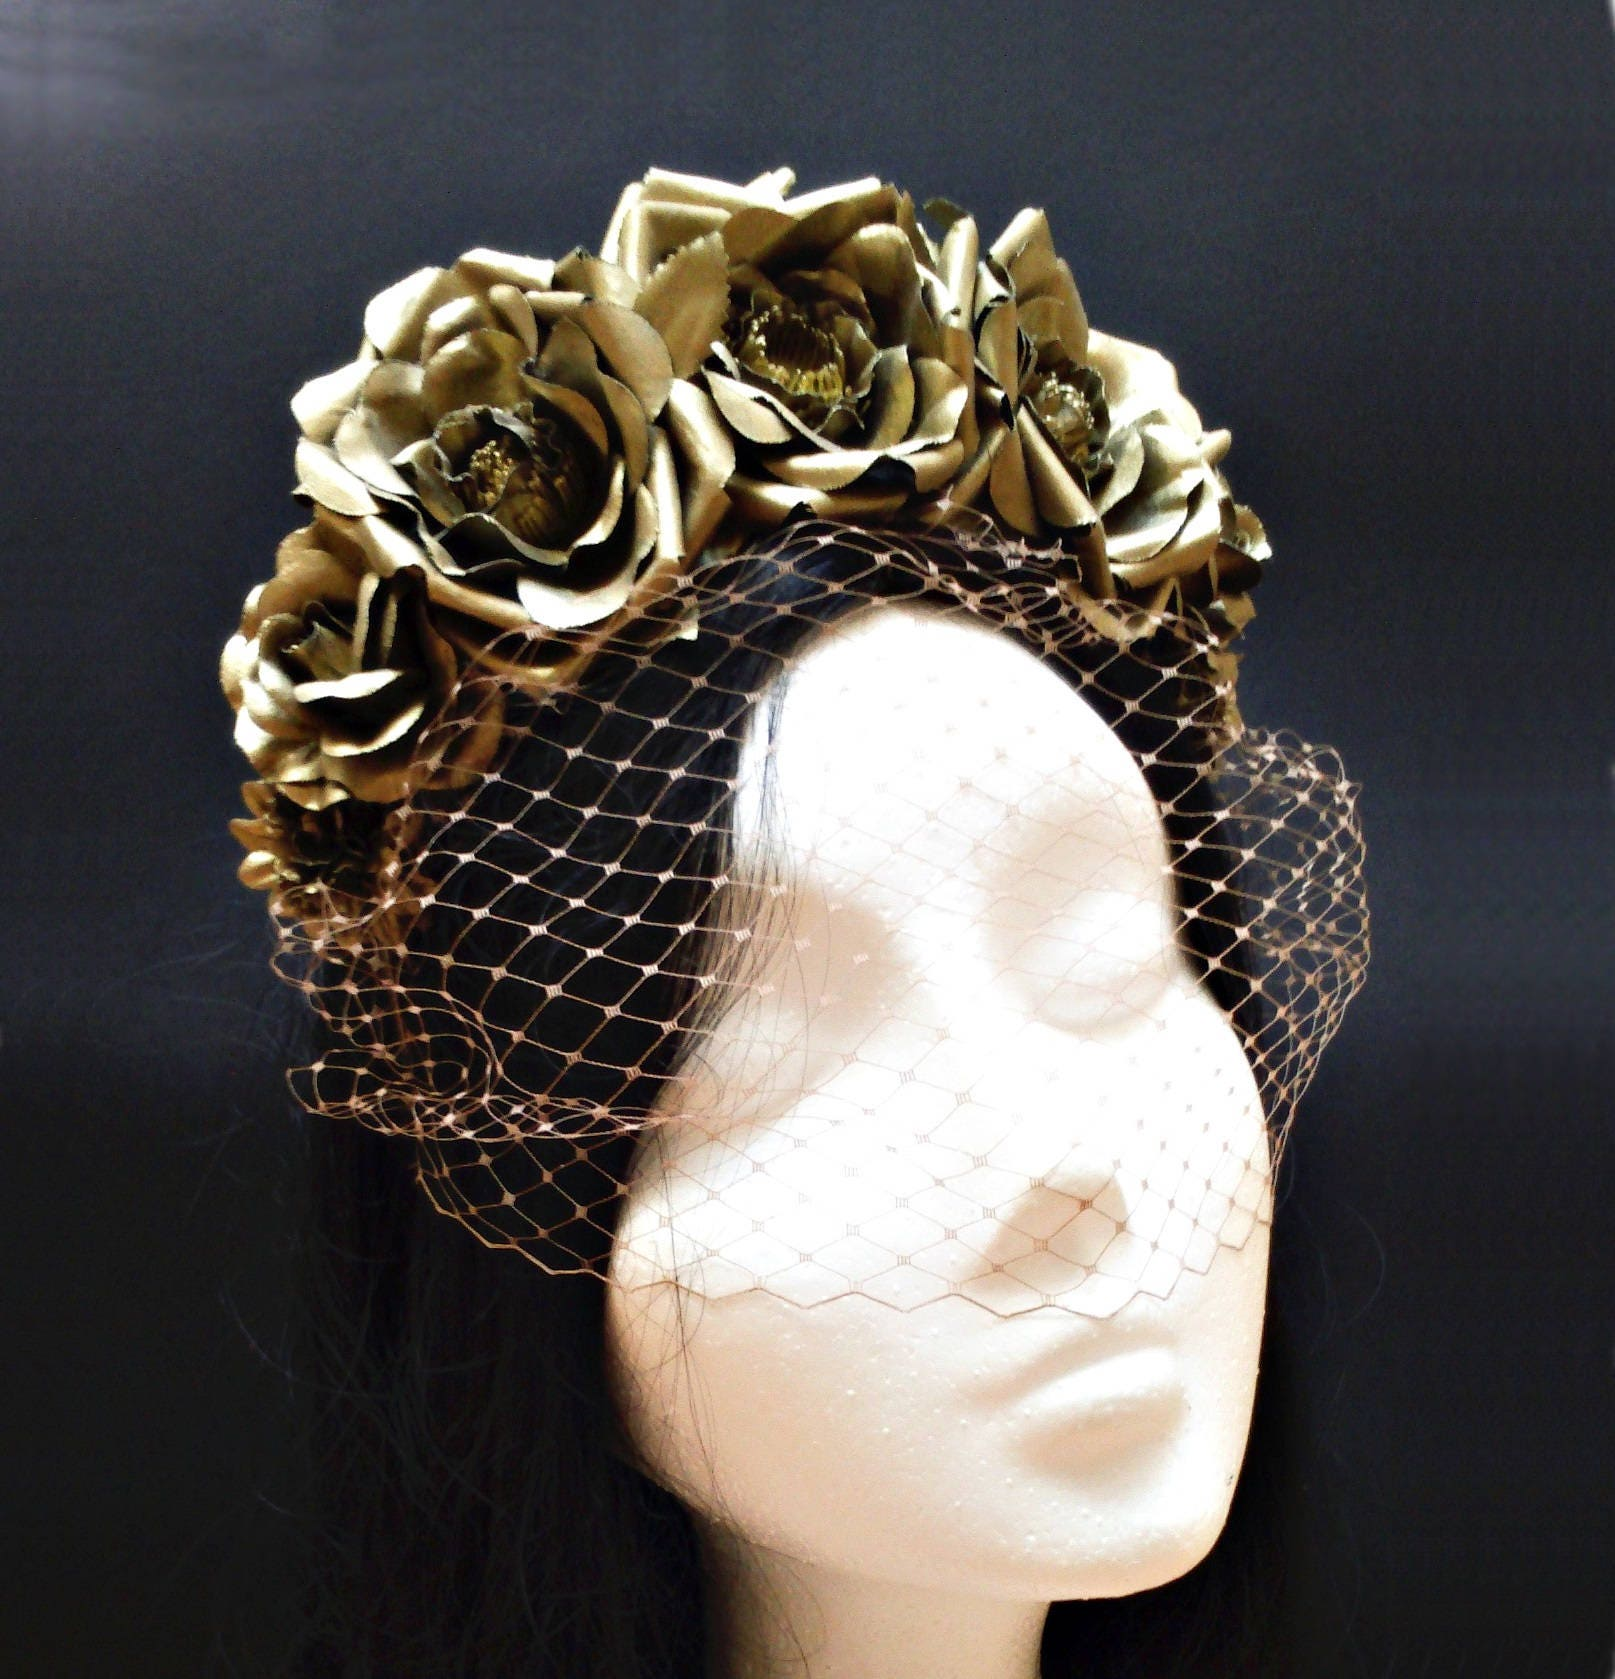 Corona flores y velo · Bridal flower crown with bird cage veil